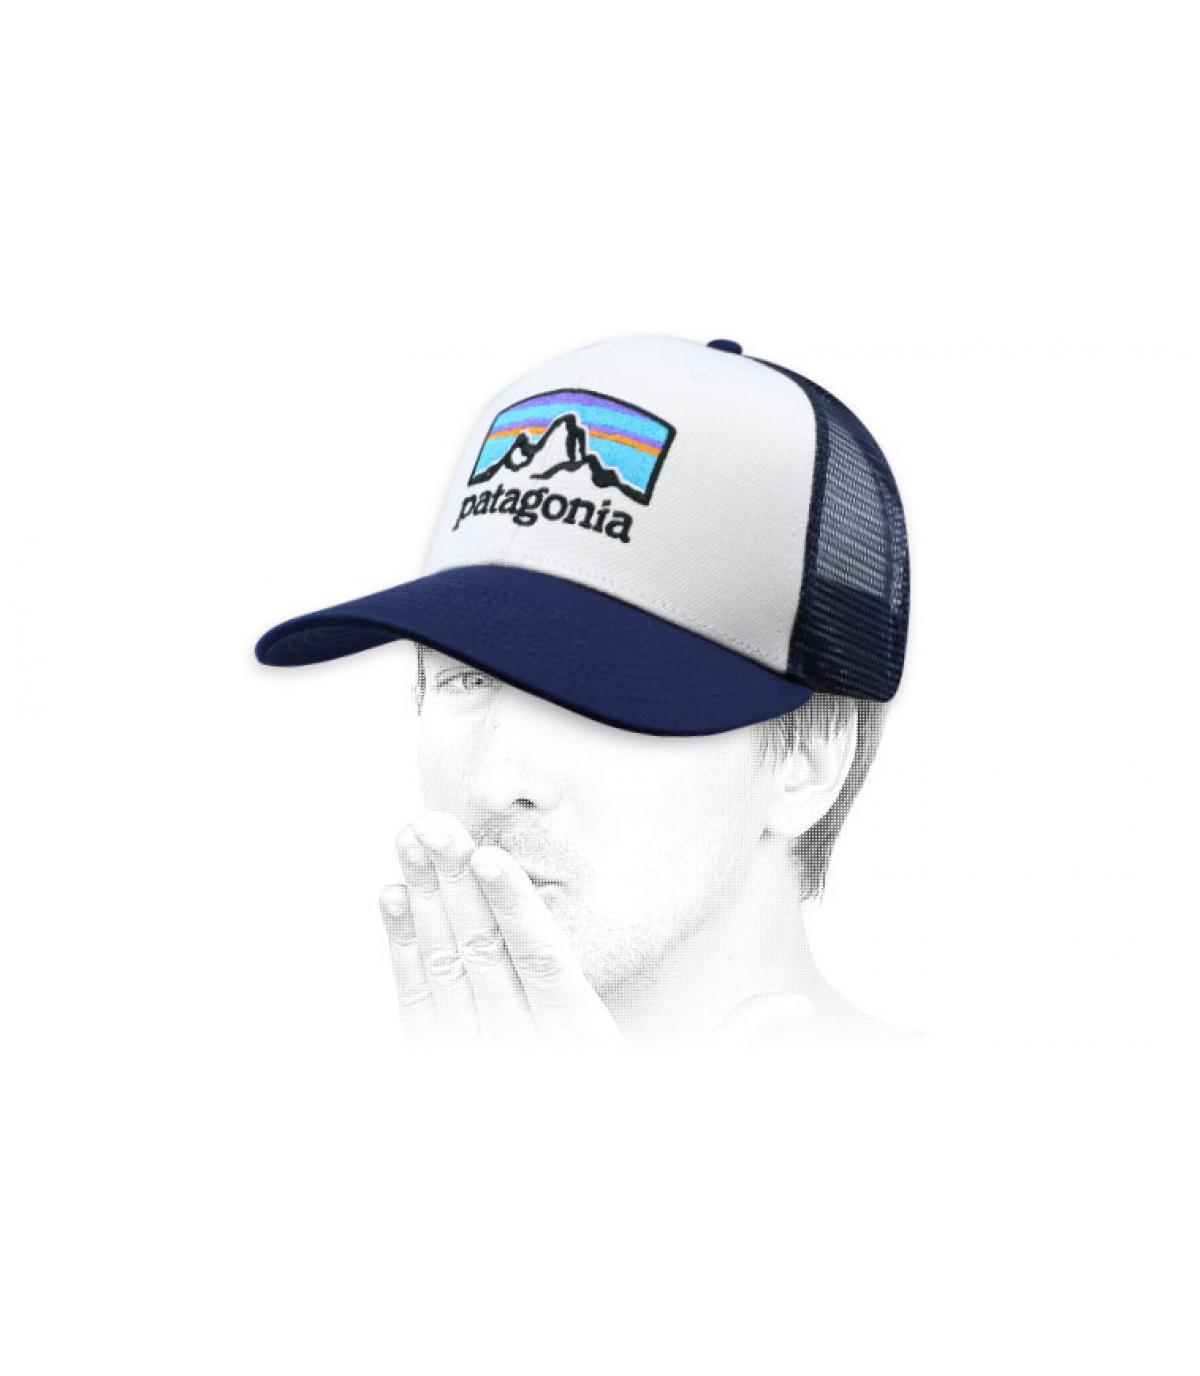 camionista blu Fitz Roy Patagonia